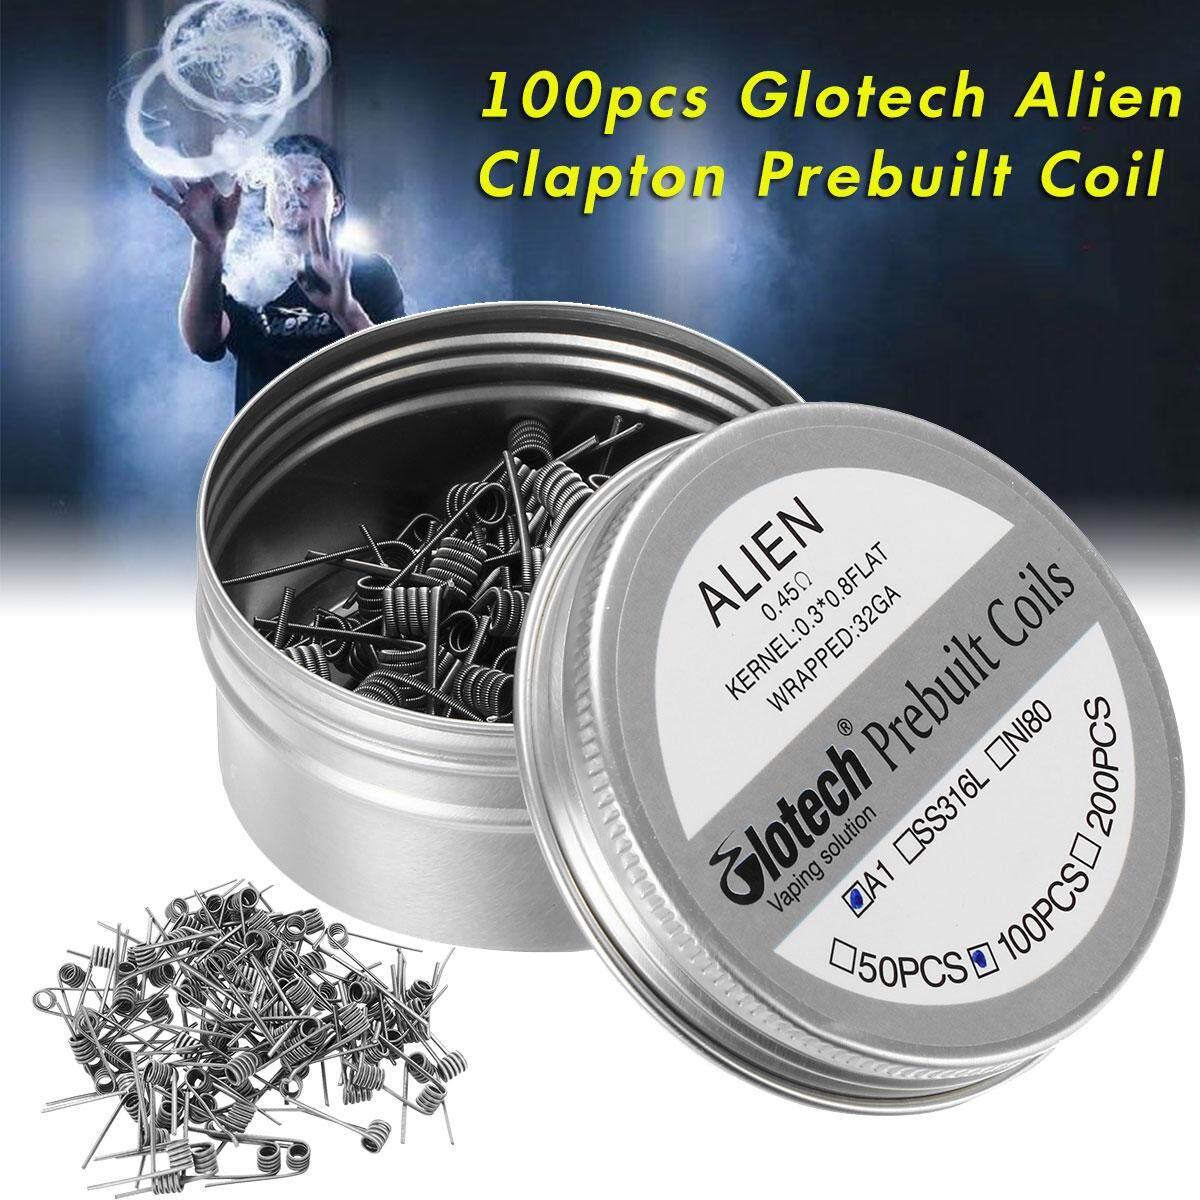 100pcs Glotech Alien clapton prebuilt coil heating wire coil DIY for RDA RBA